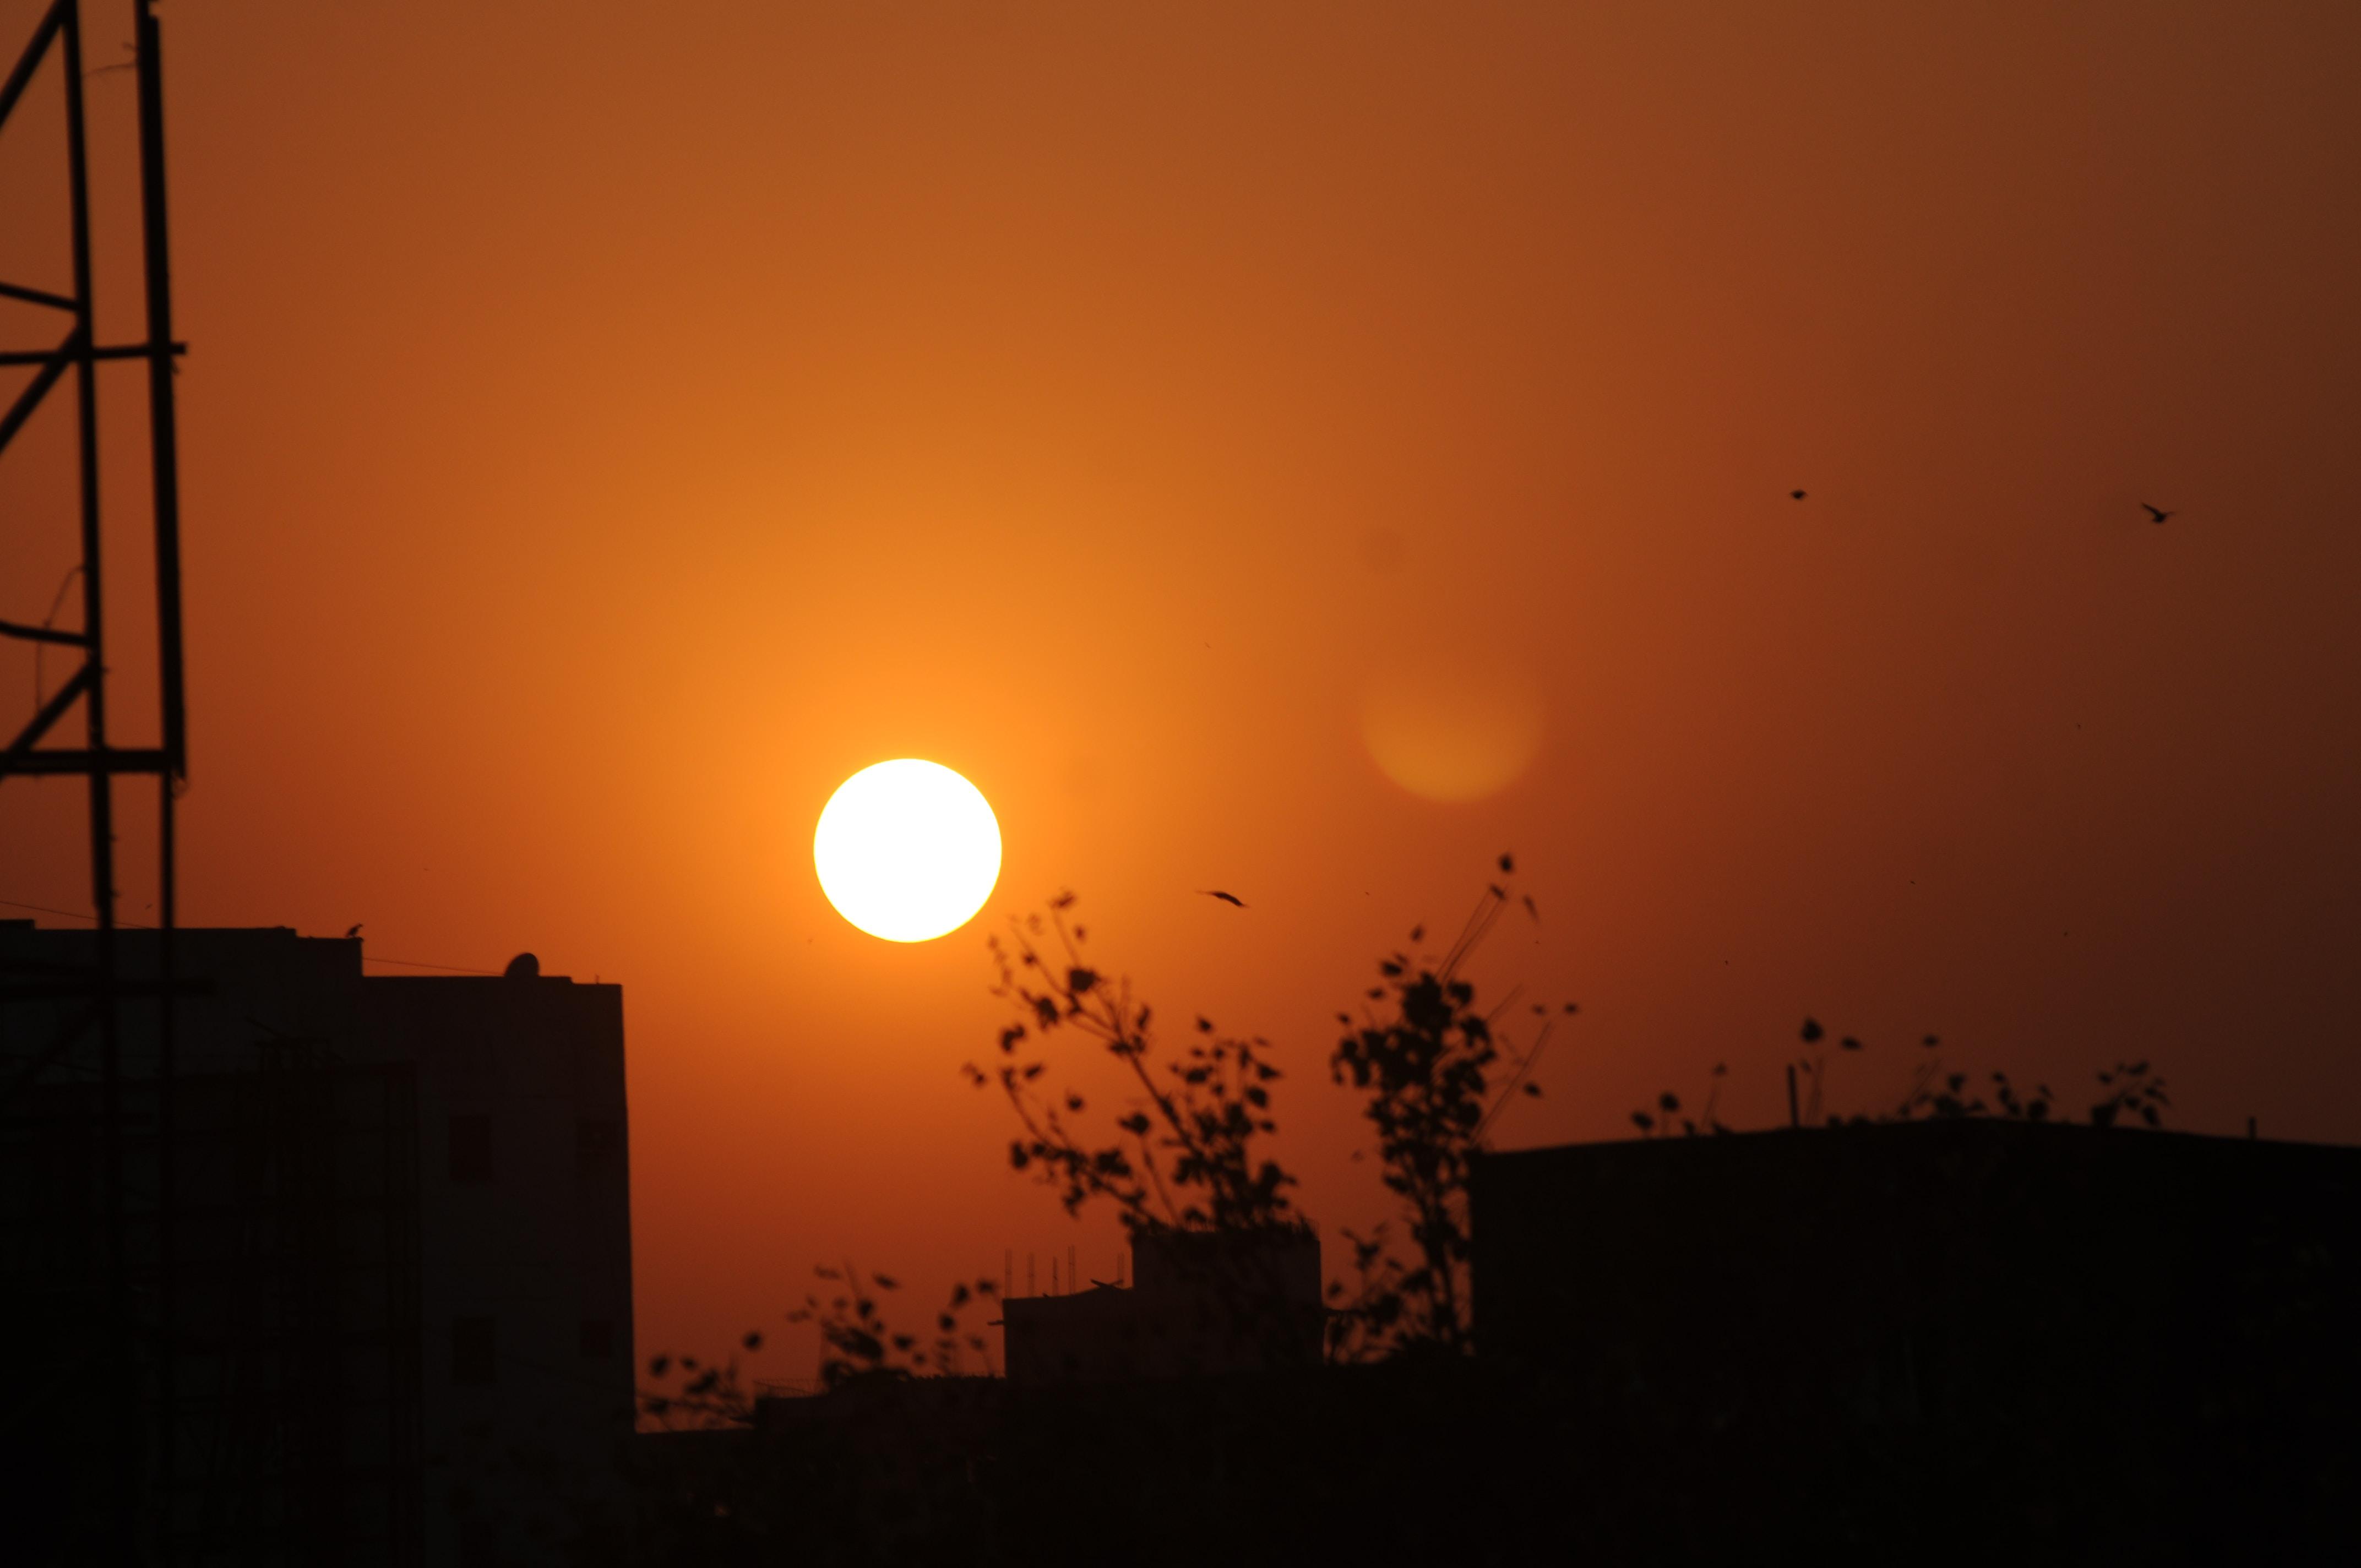 Free Unsplash photo from Harshil Acharya